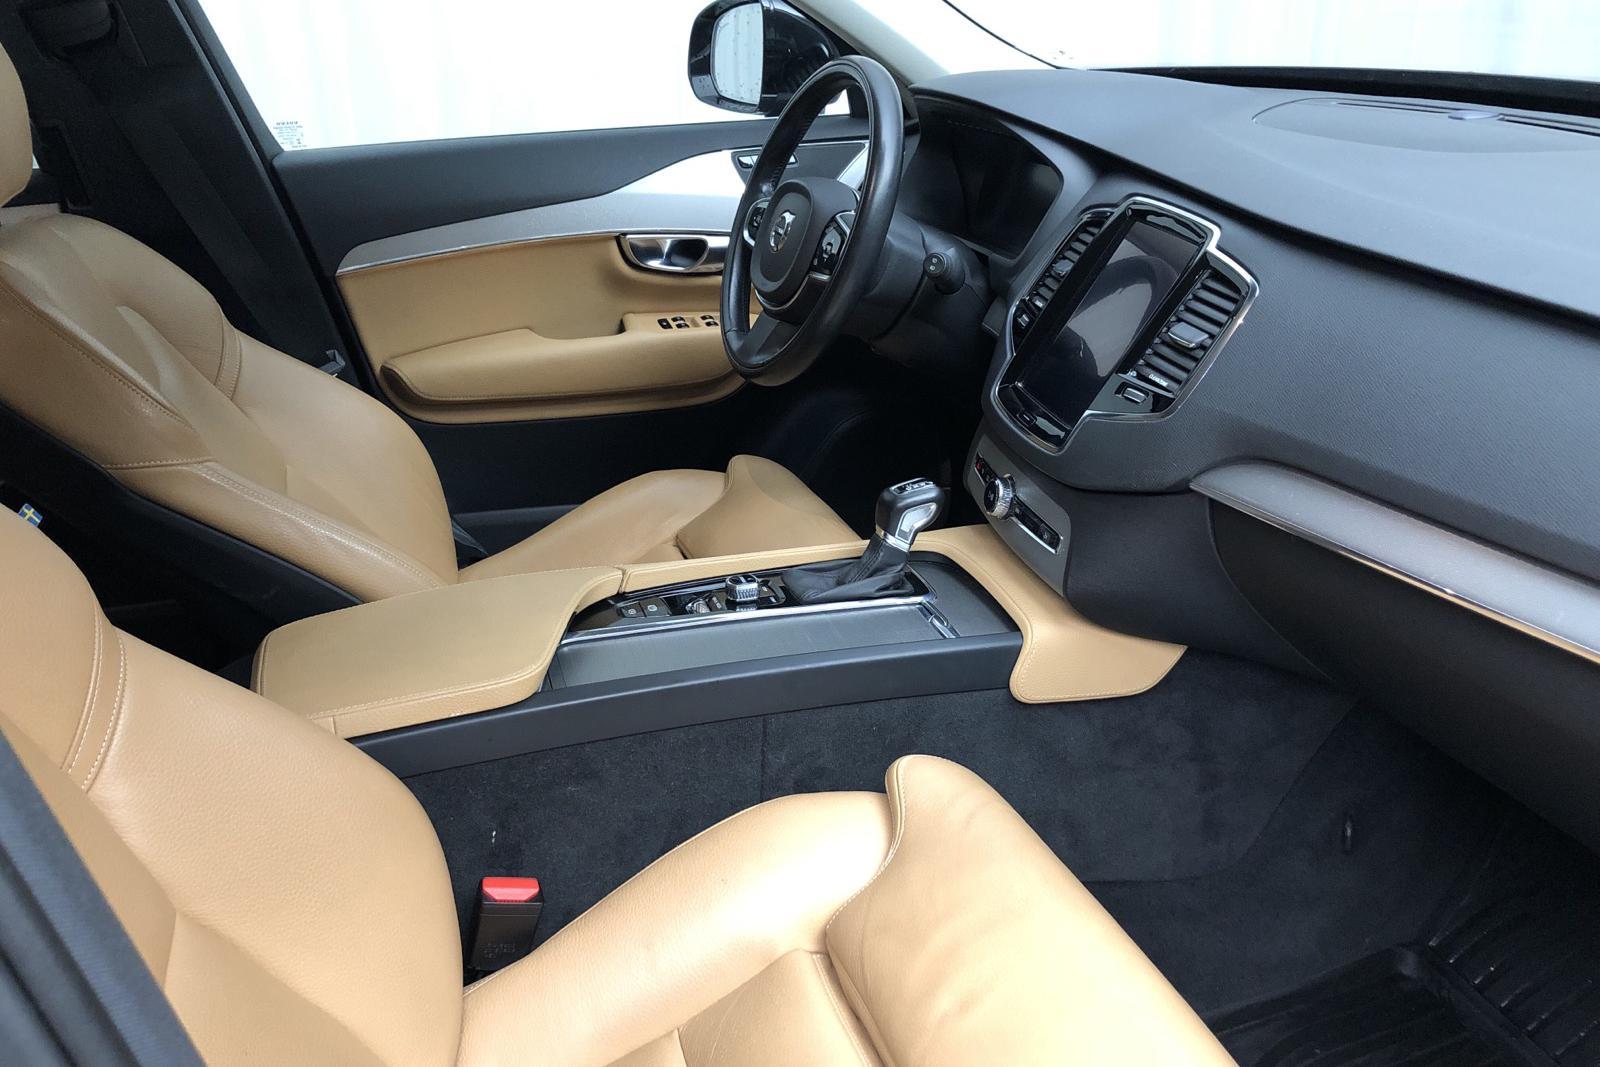 Volvo XC90 D5 AWD (225hk) - 96 000 km - Automatic - black - 2016